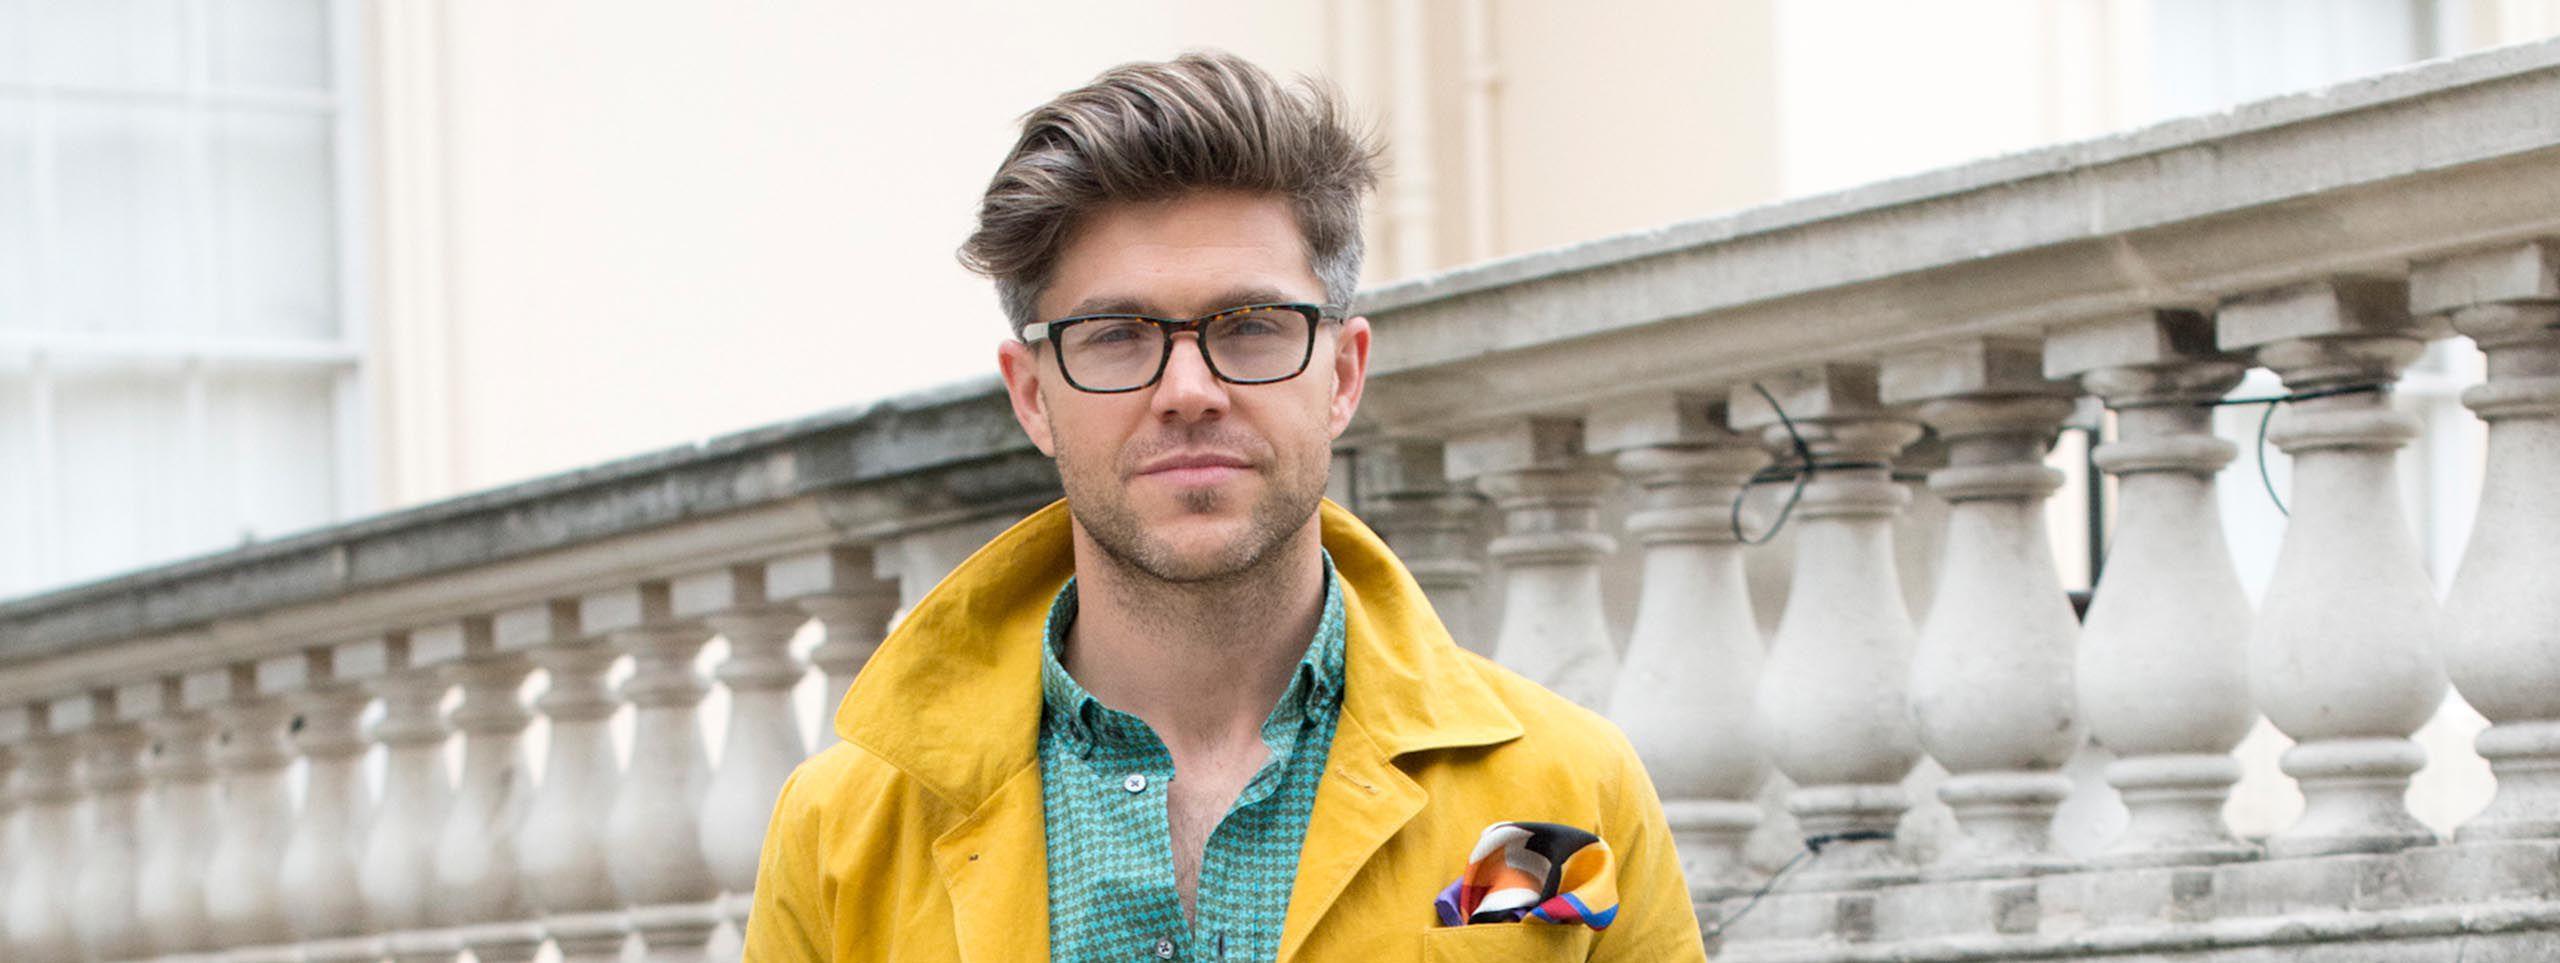 Muškarac s façon frizurom i naočalama